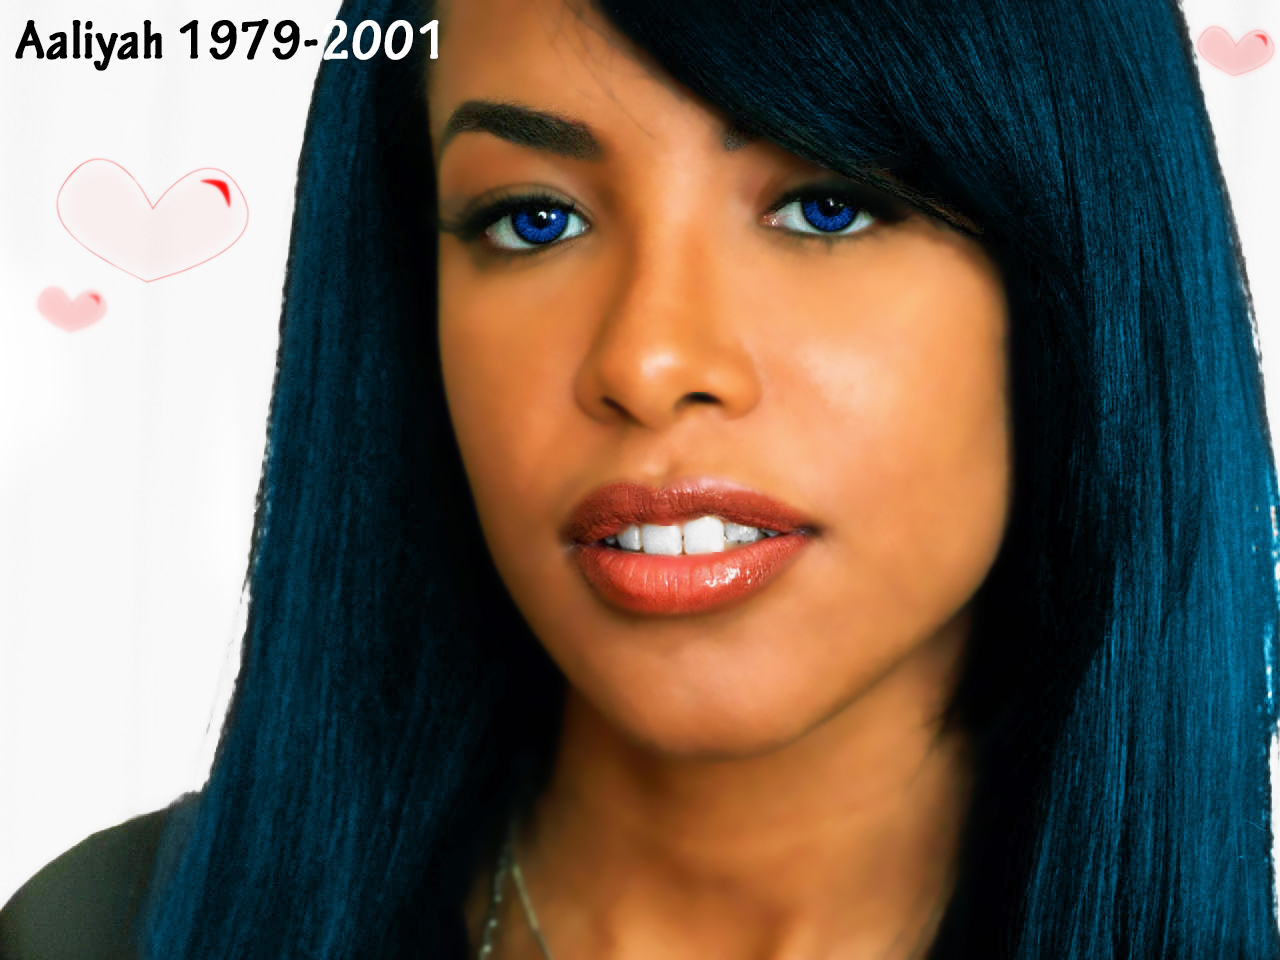 Aaliyah - Happy Birthday January 16th, 2013 - aaliyah Photo